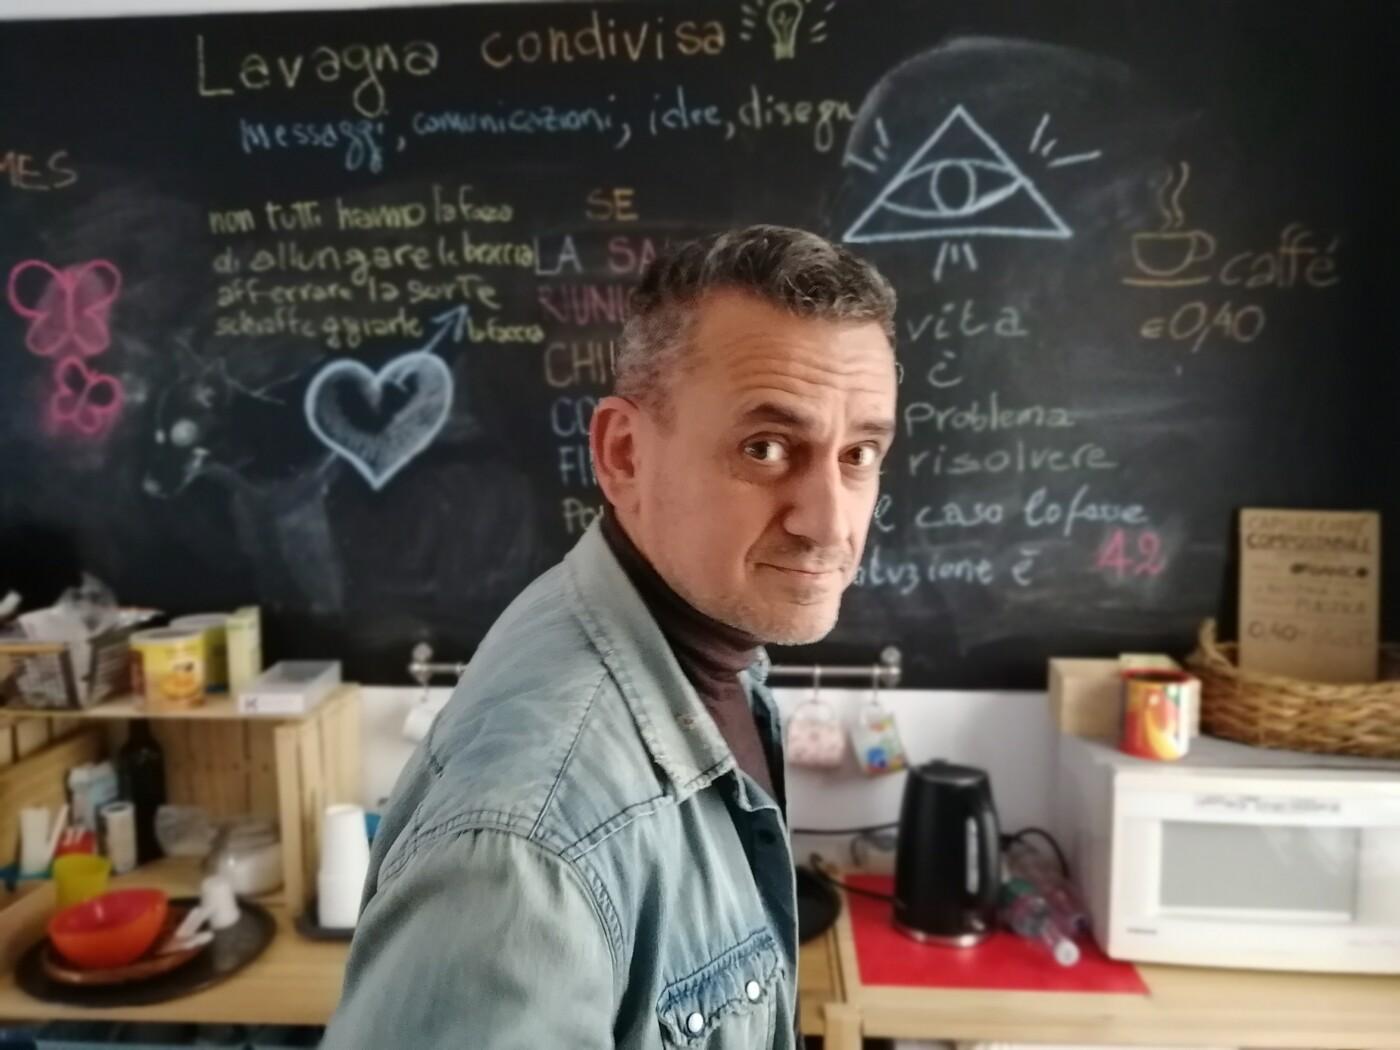 Massimo Santori - Manager